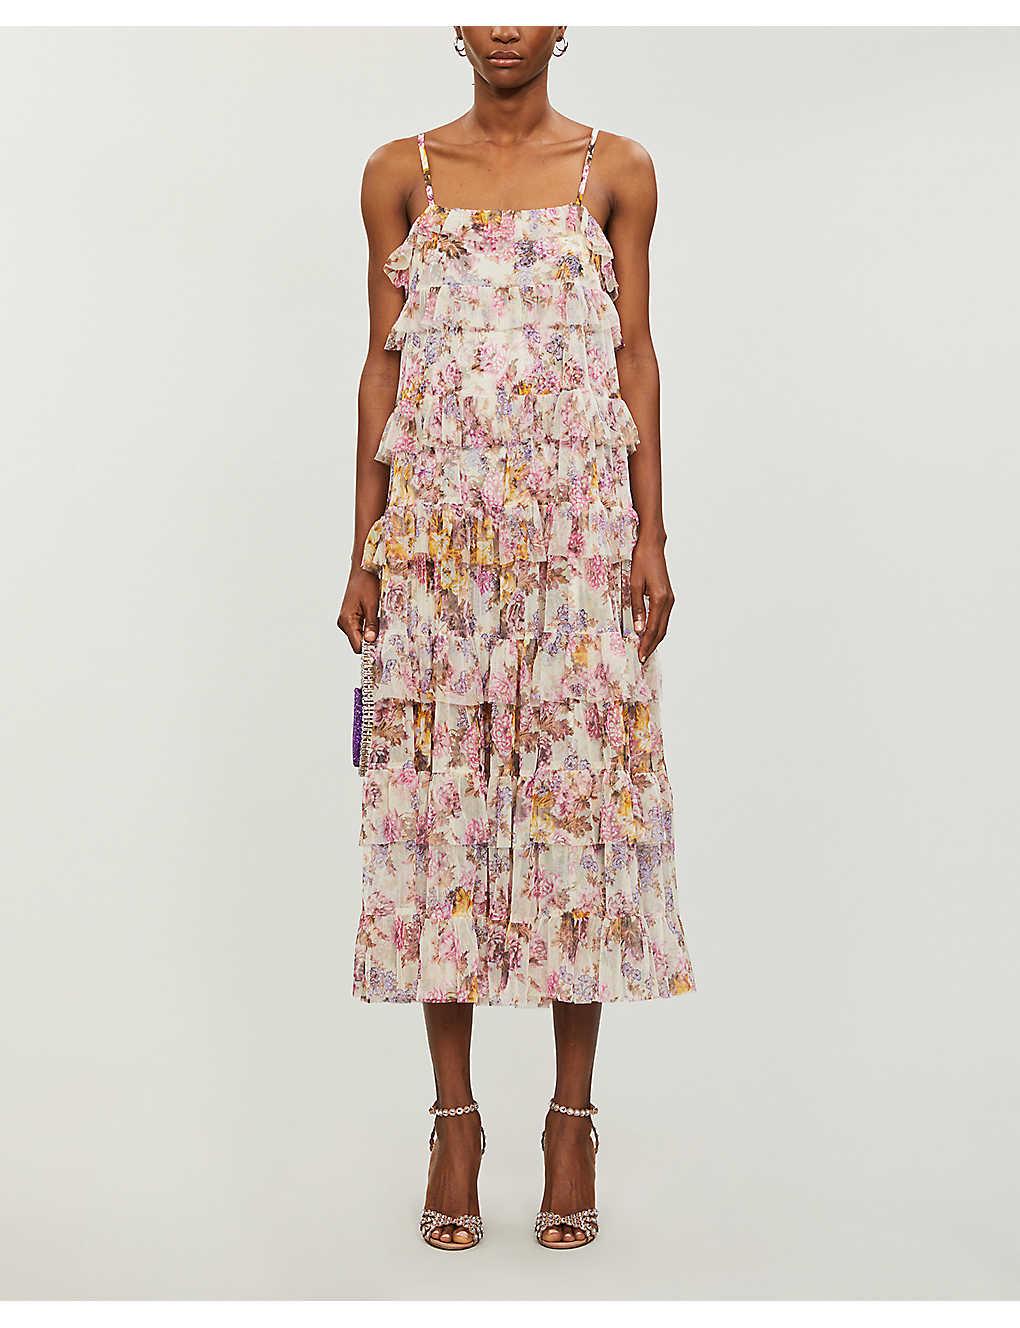 NEEDLE AND THREAD X Jasmine Hemsley Harmony Floral-print Recycled Tulle Midi Dress